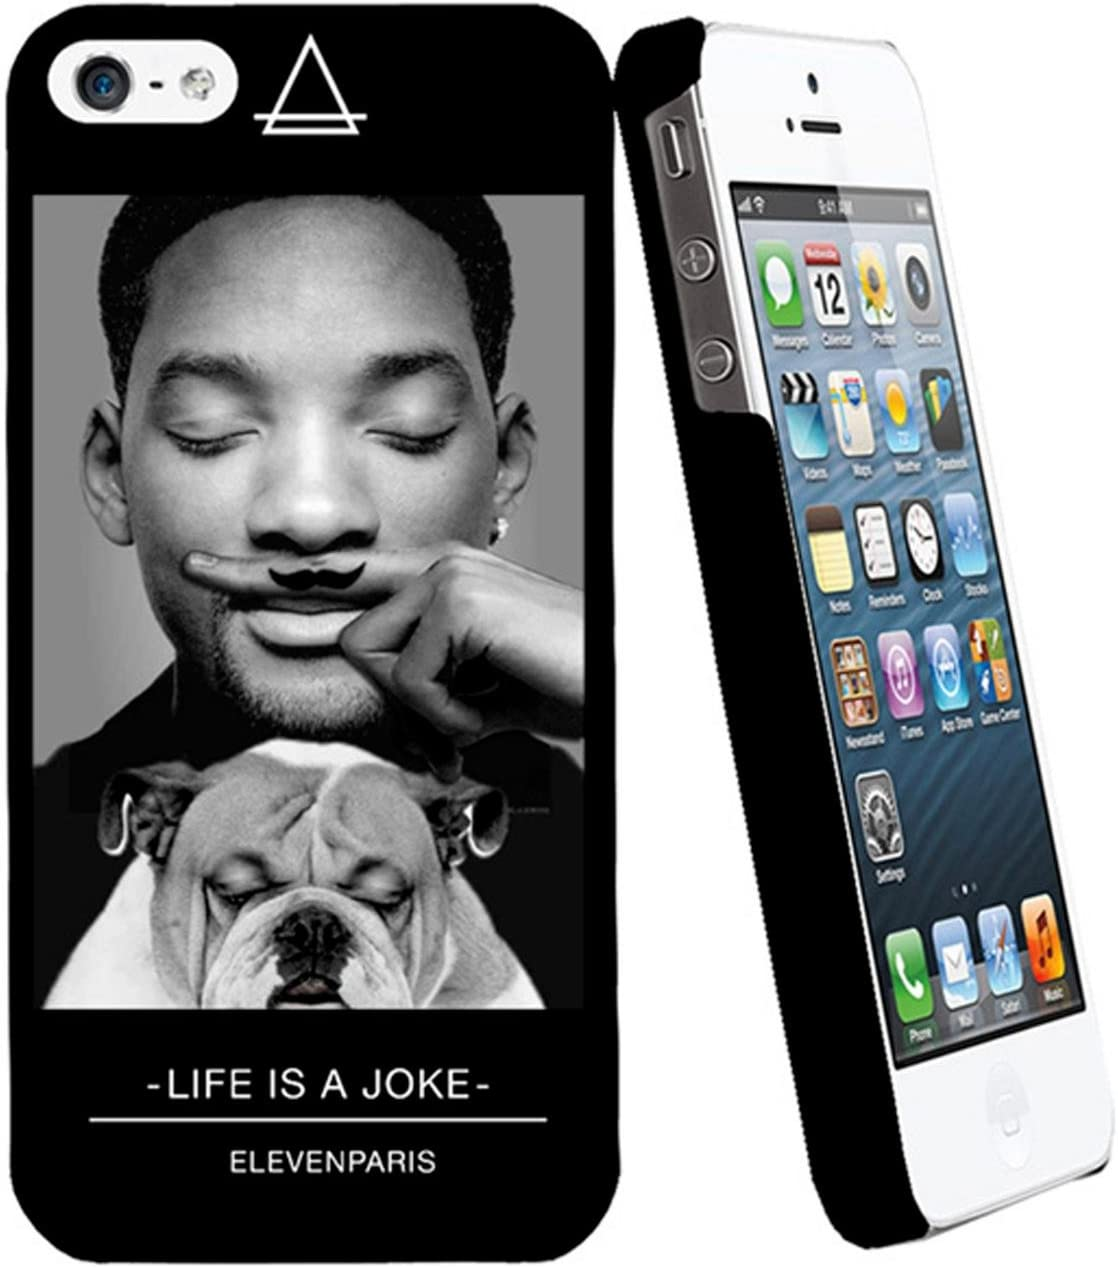 Eleven paris - Coque iPhone 5 - Will Smith: Amazon.fr: High-tech